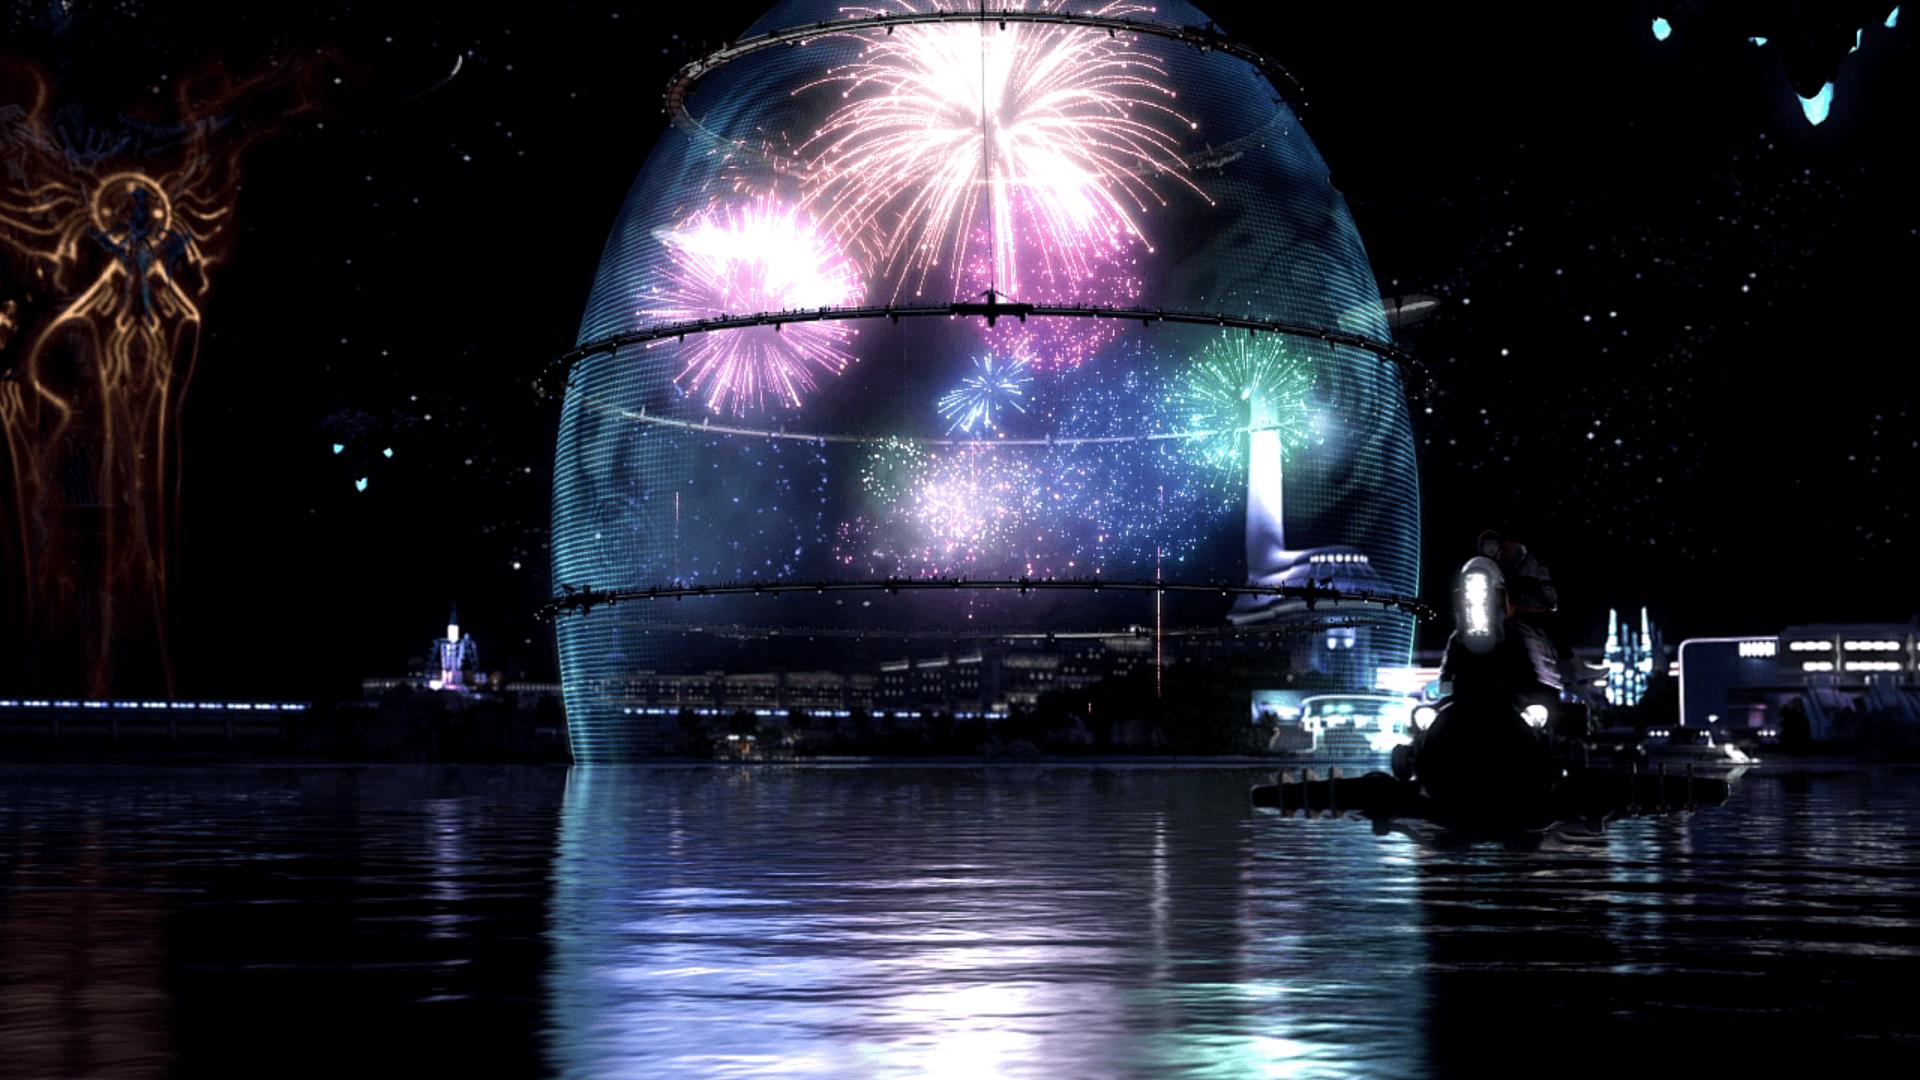 Final Fantasy XIII Bodhum fireworks